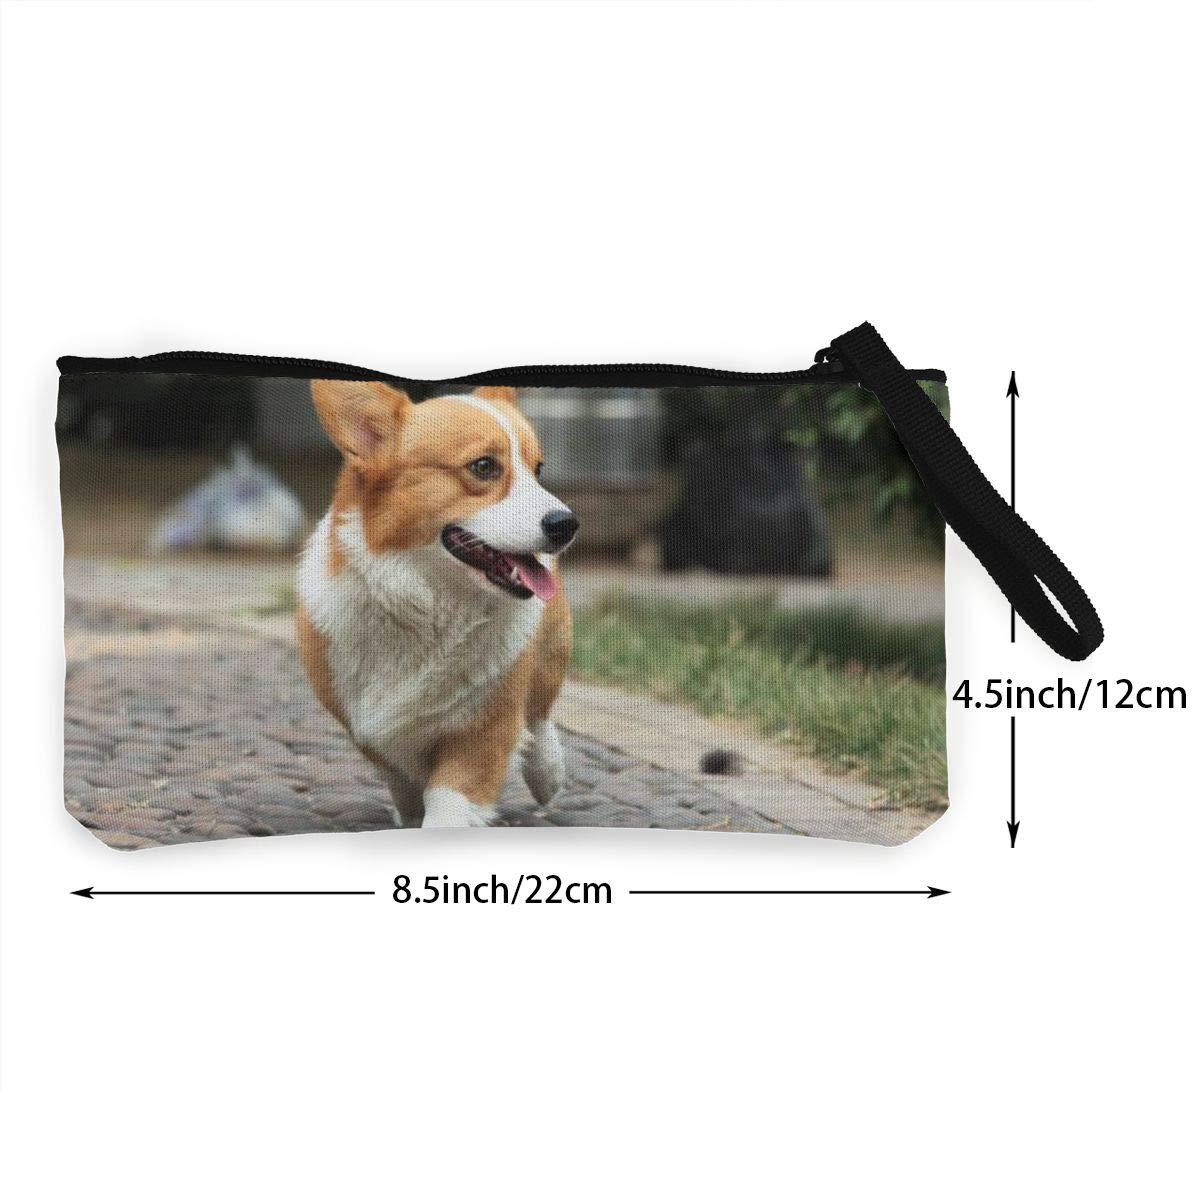 YUANSHAN Walking Dog Unisex Canvas Coin Purse Change Cash Bag Zipper Small Purse Wallets with Handle